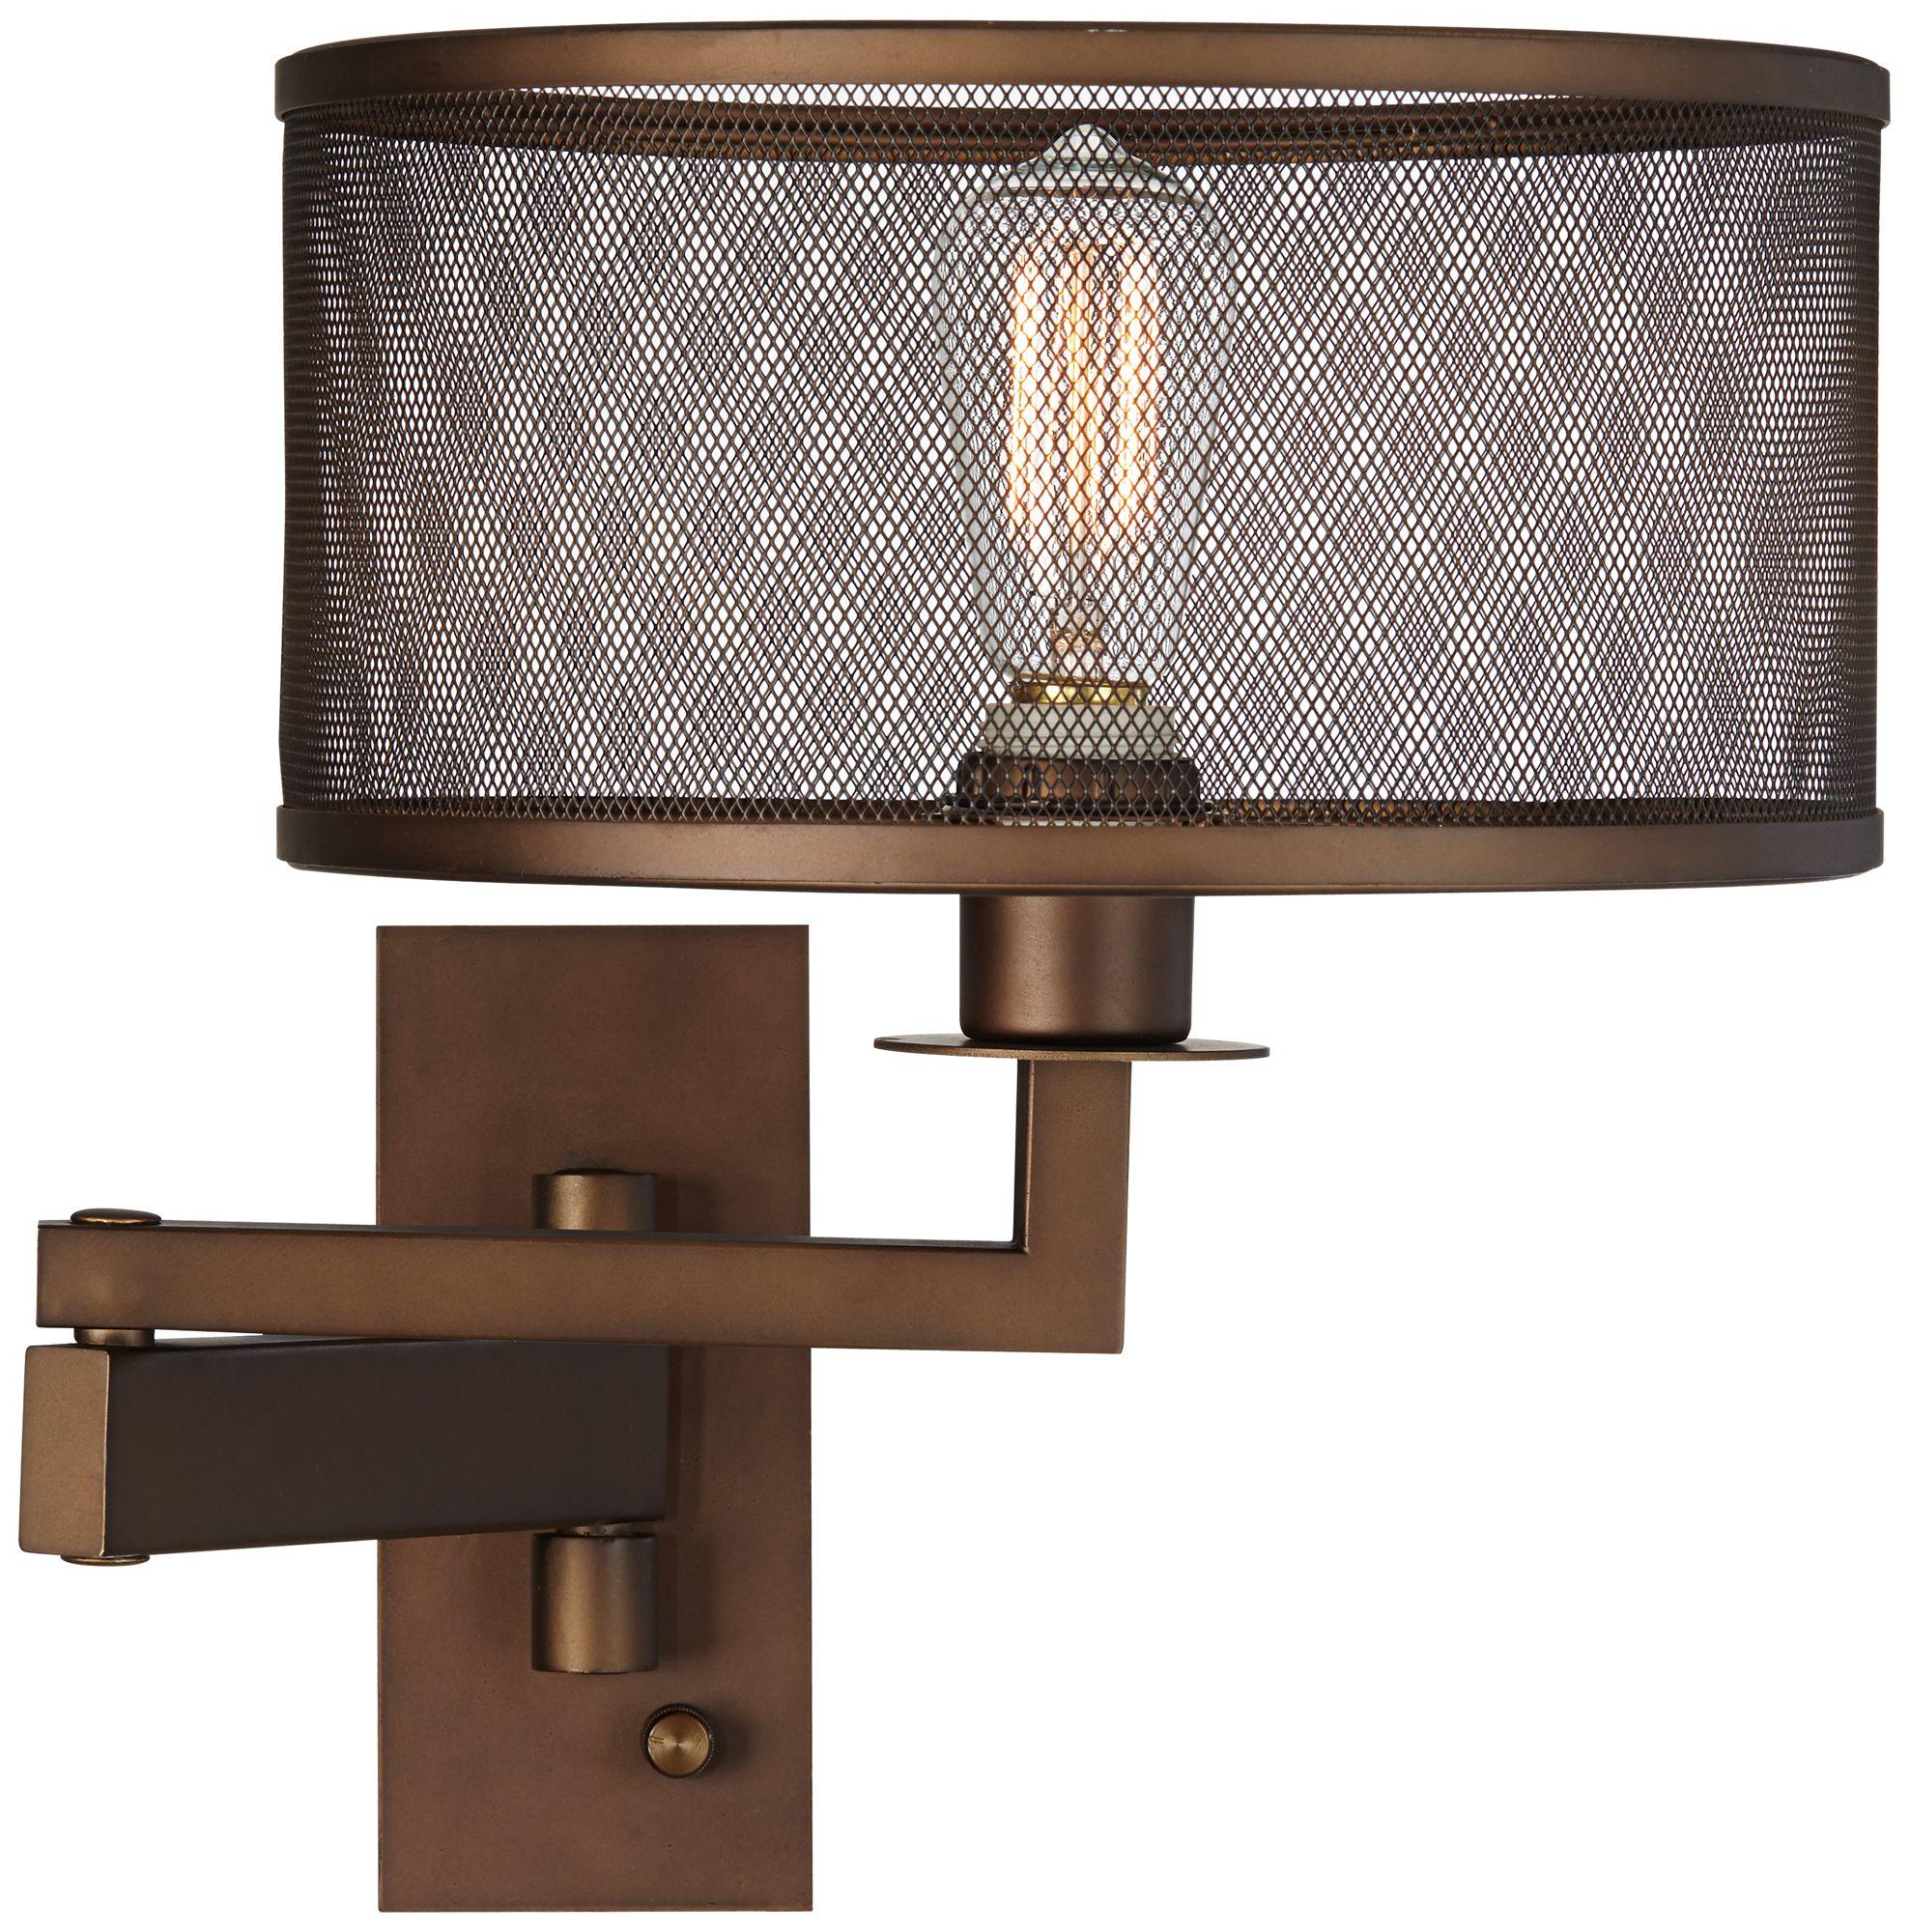 svende oil rubbed bronze plugin swing arm wall lamp